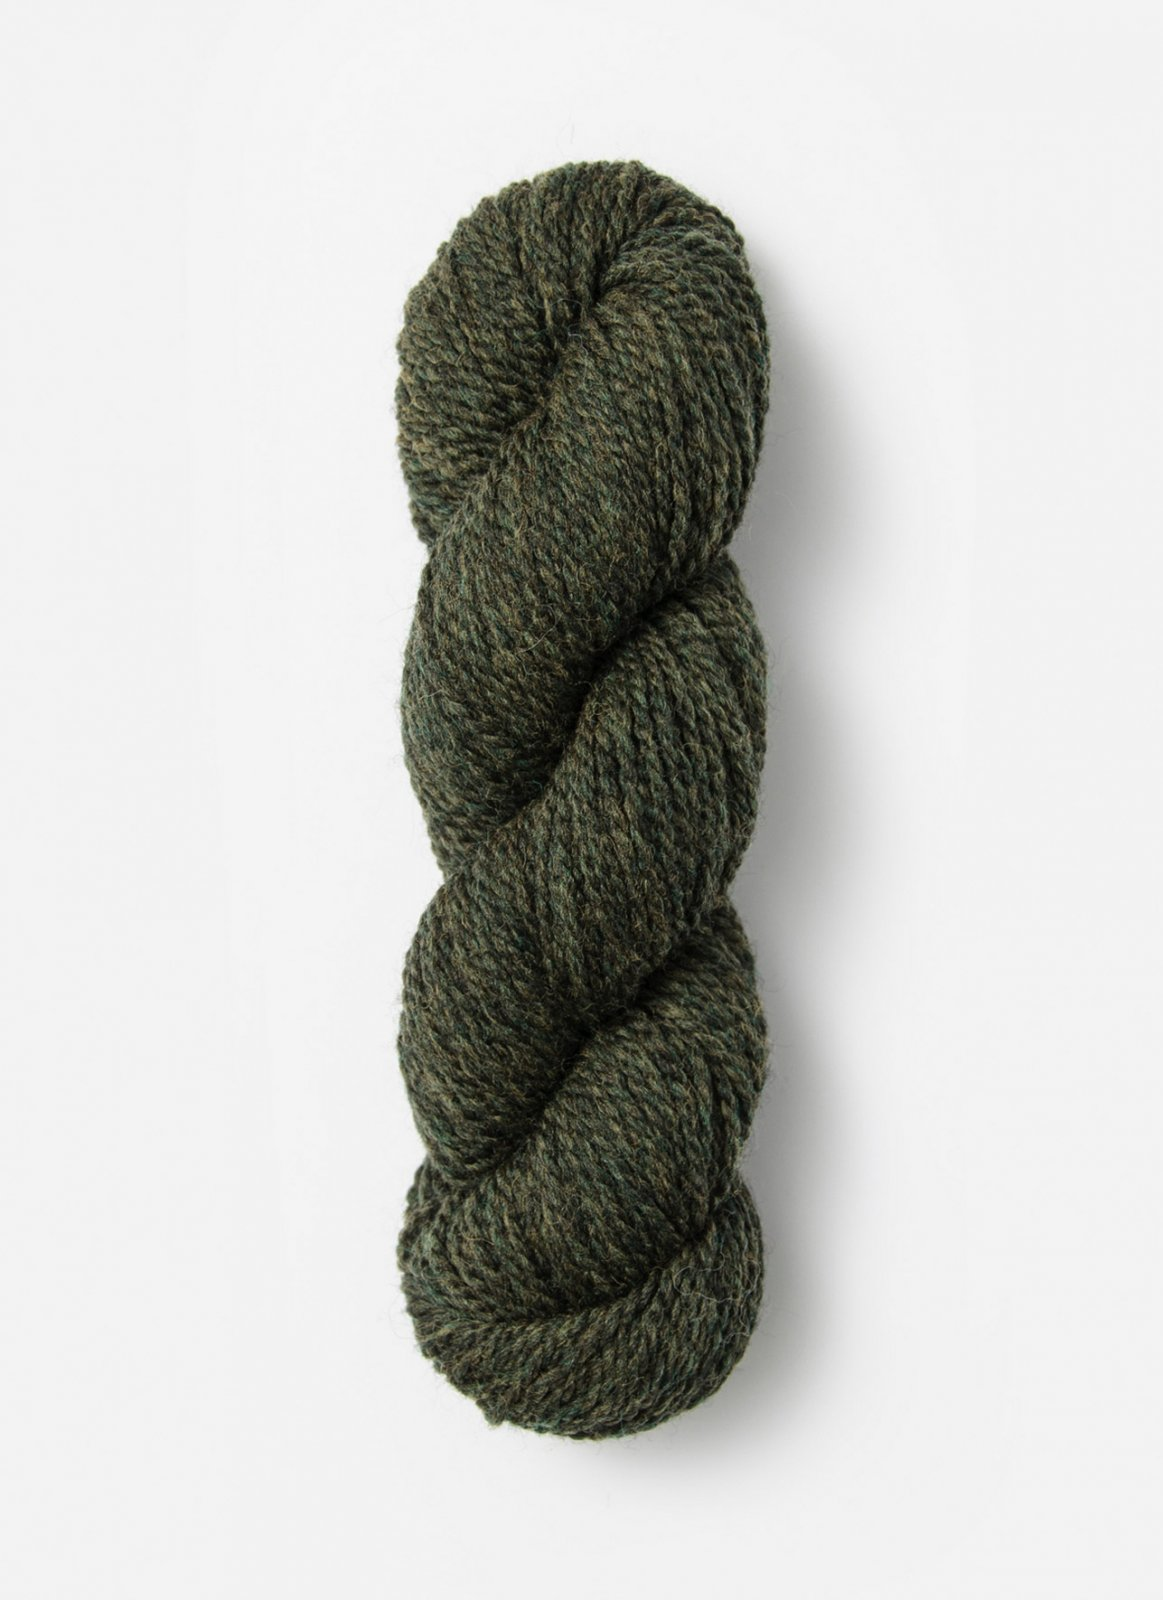 Blue Sky Fibers Woolstok Worsted (150g)